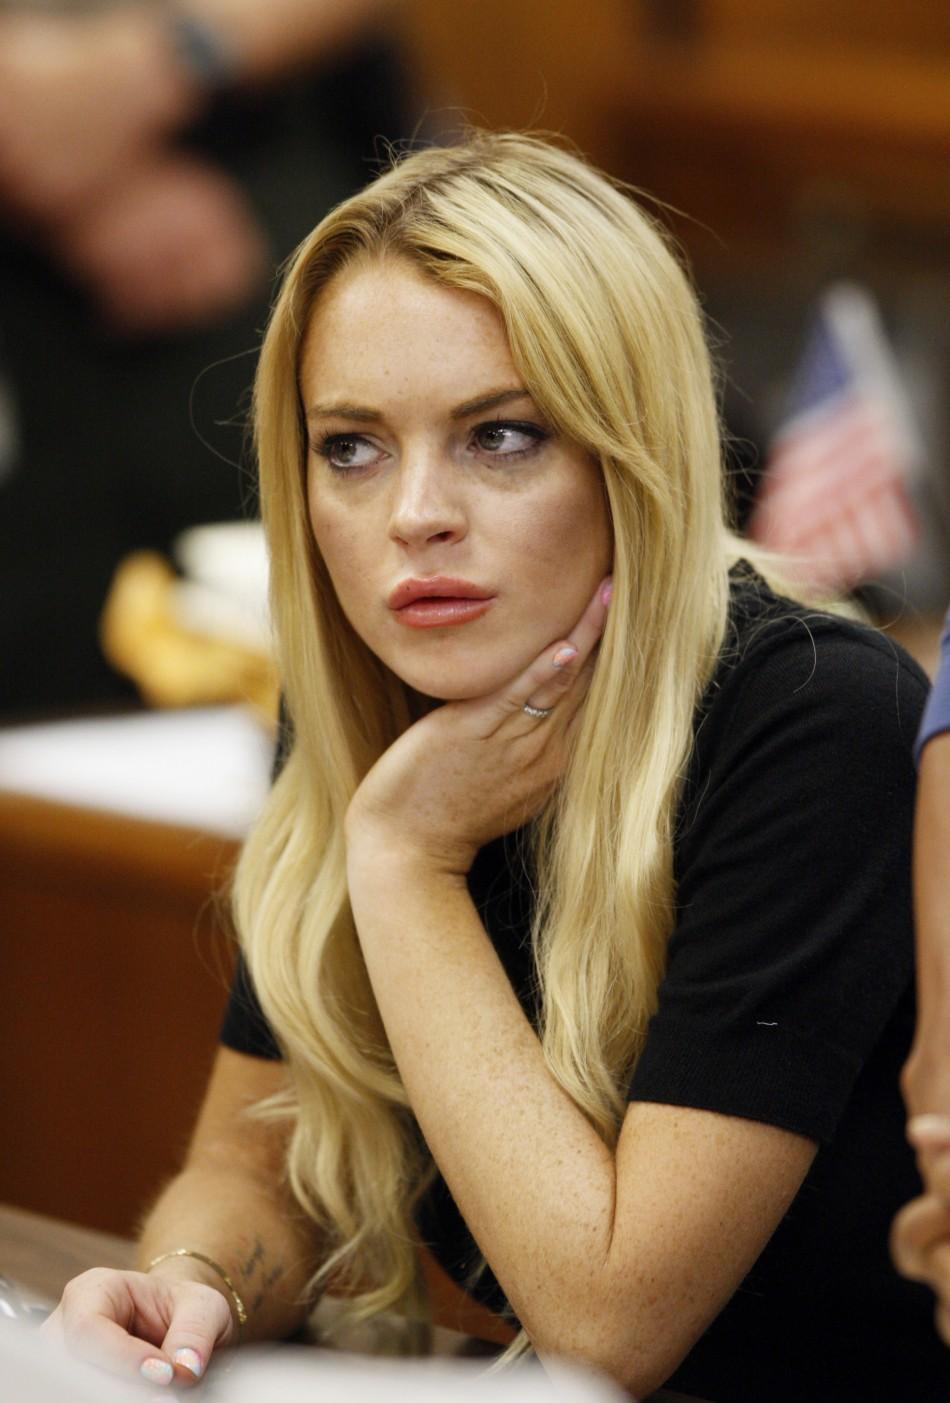 Lindsay Lohan To Play Elizabeth Taylor in Lifetime Biopic